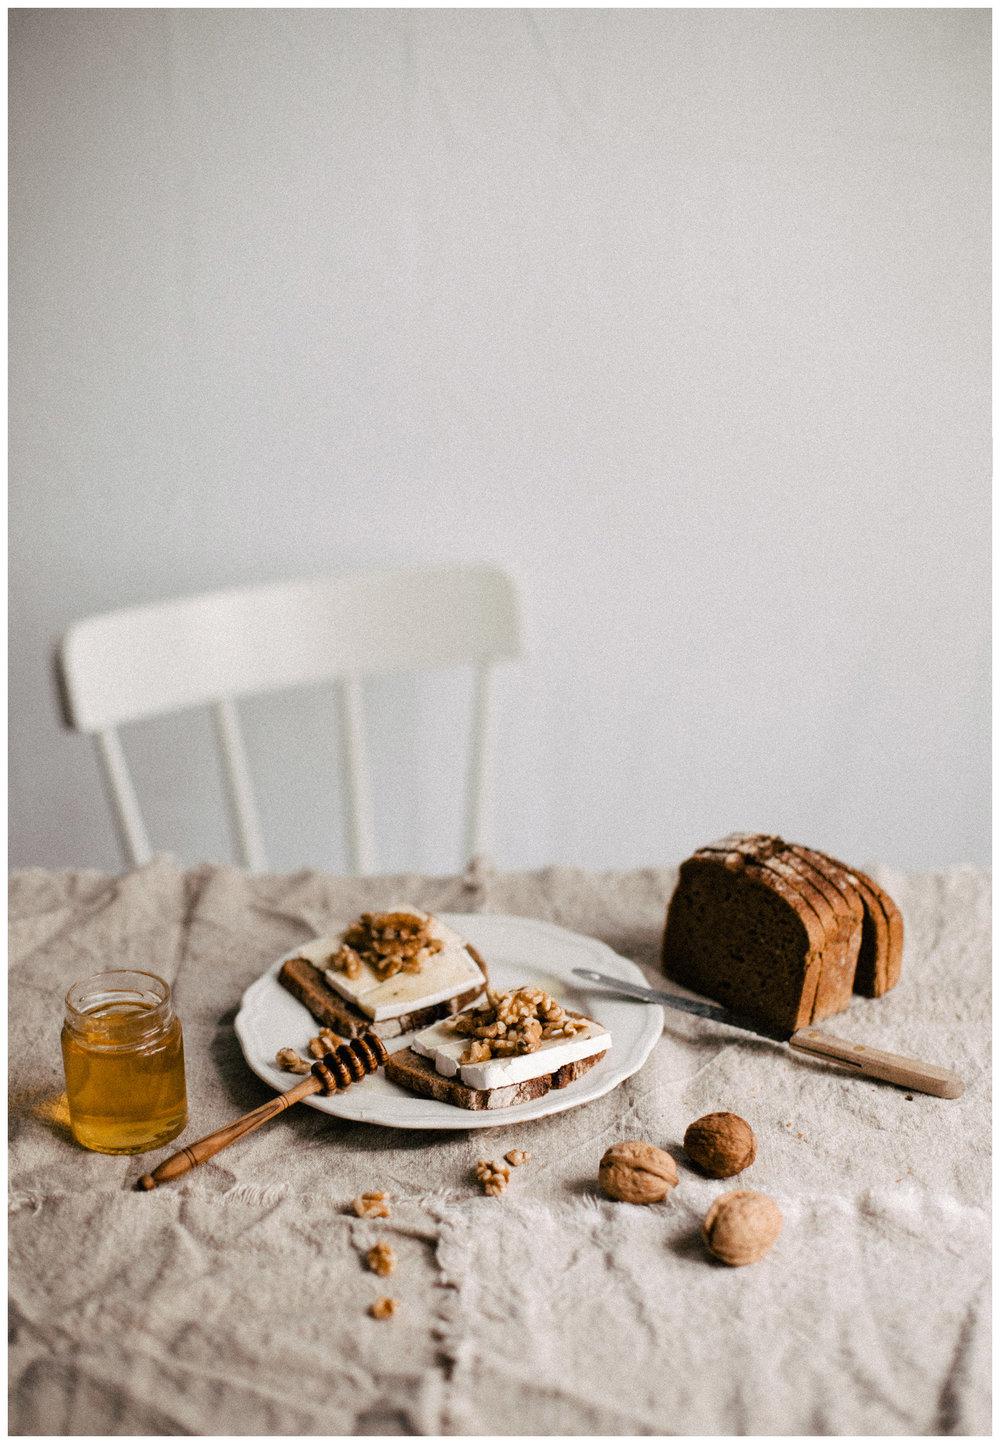 blogger-berlin-food-honig-kiezbiene-ohhedwig_1